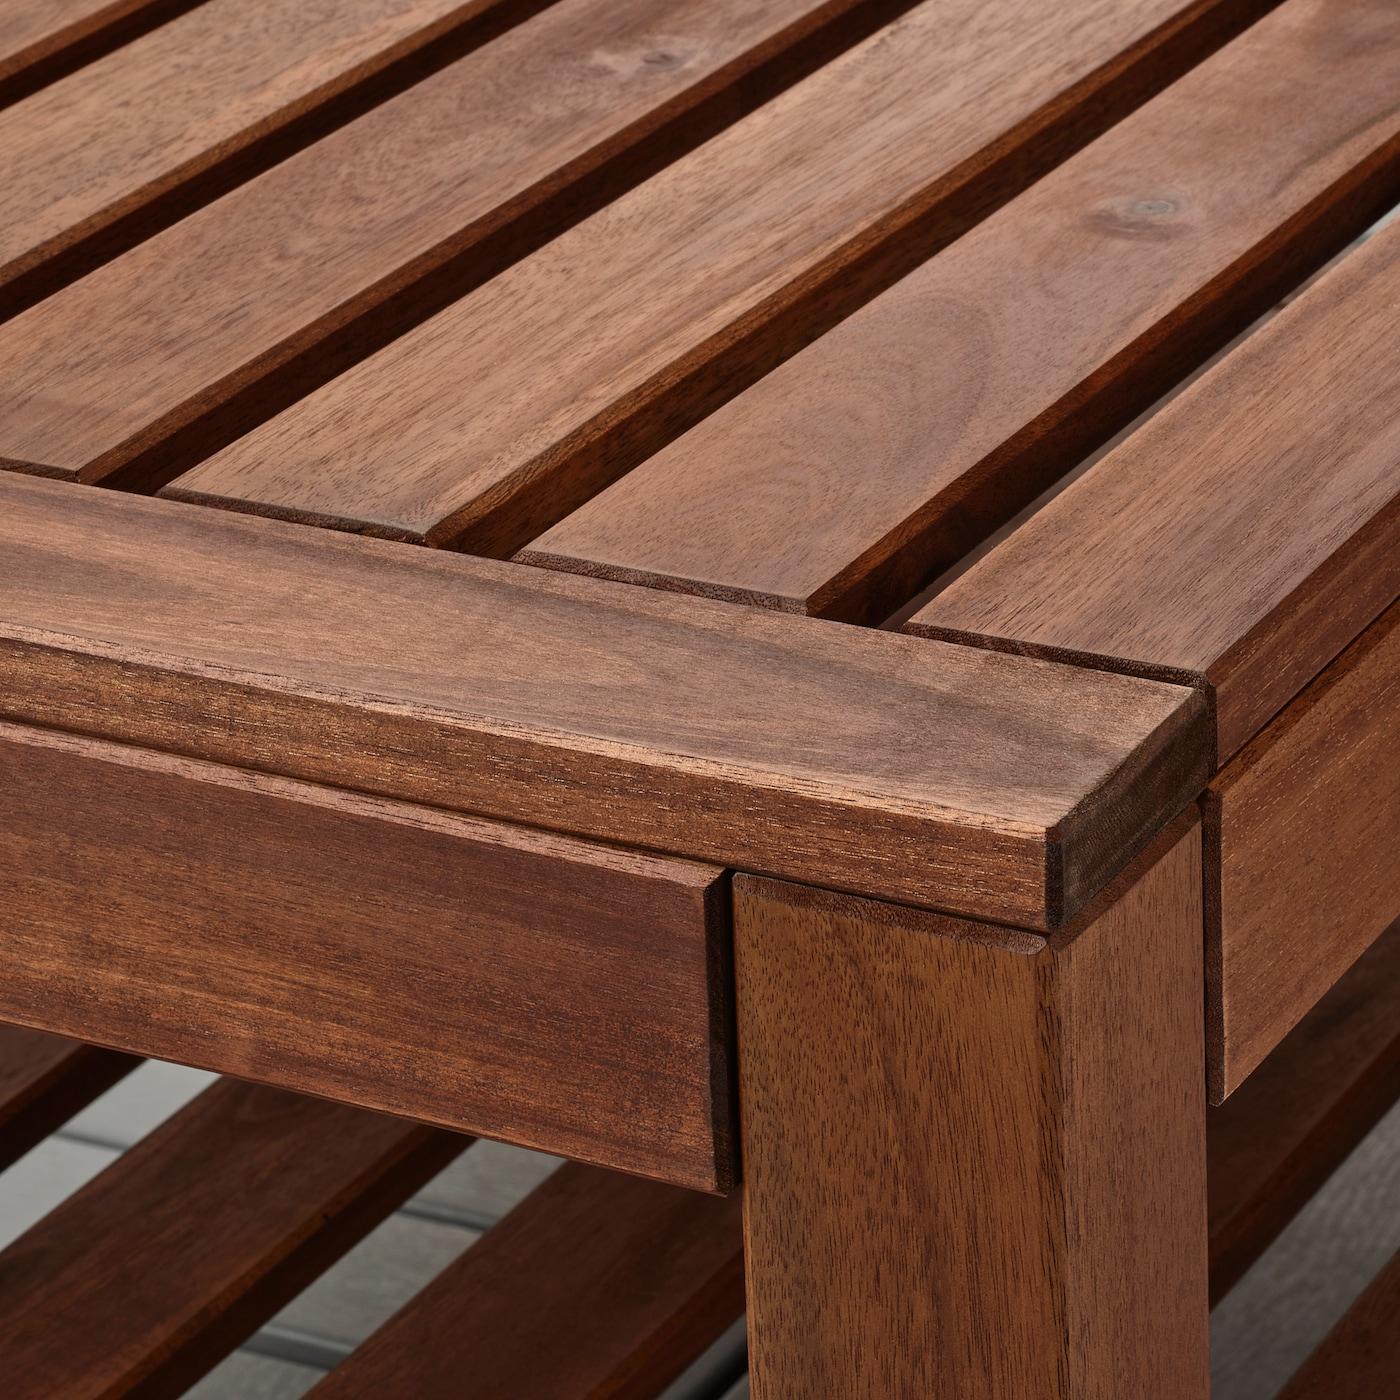 ÄPPLARÖ Table basse, extérieur, teinté brun, 90x55 cm